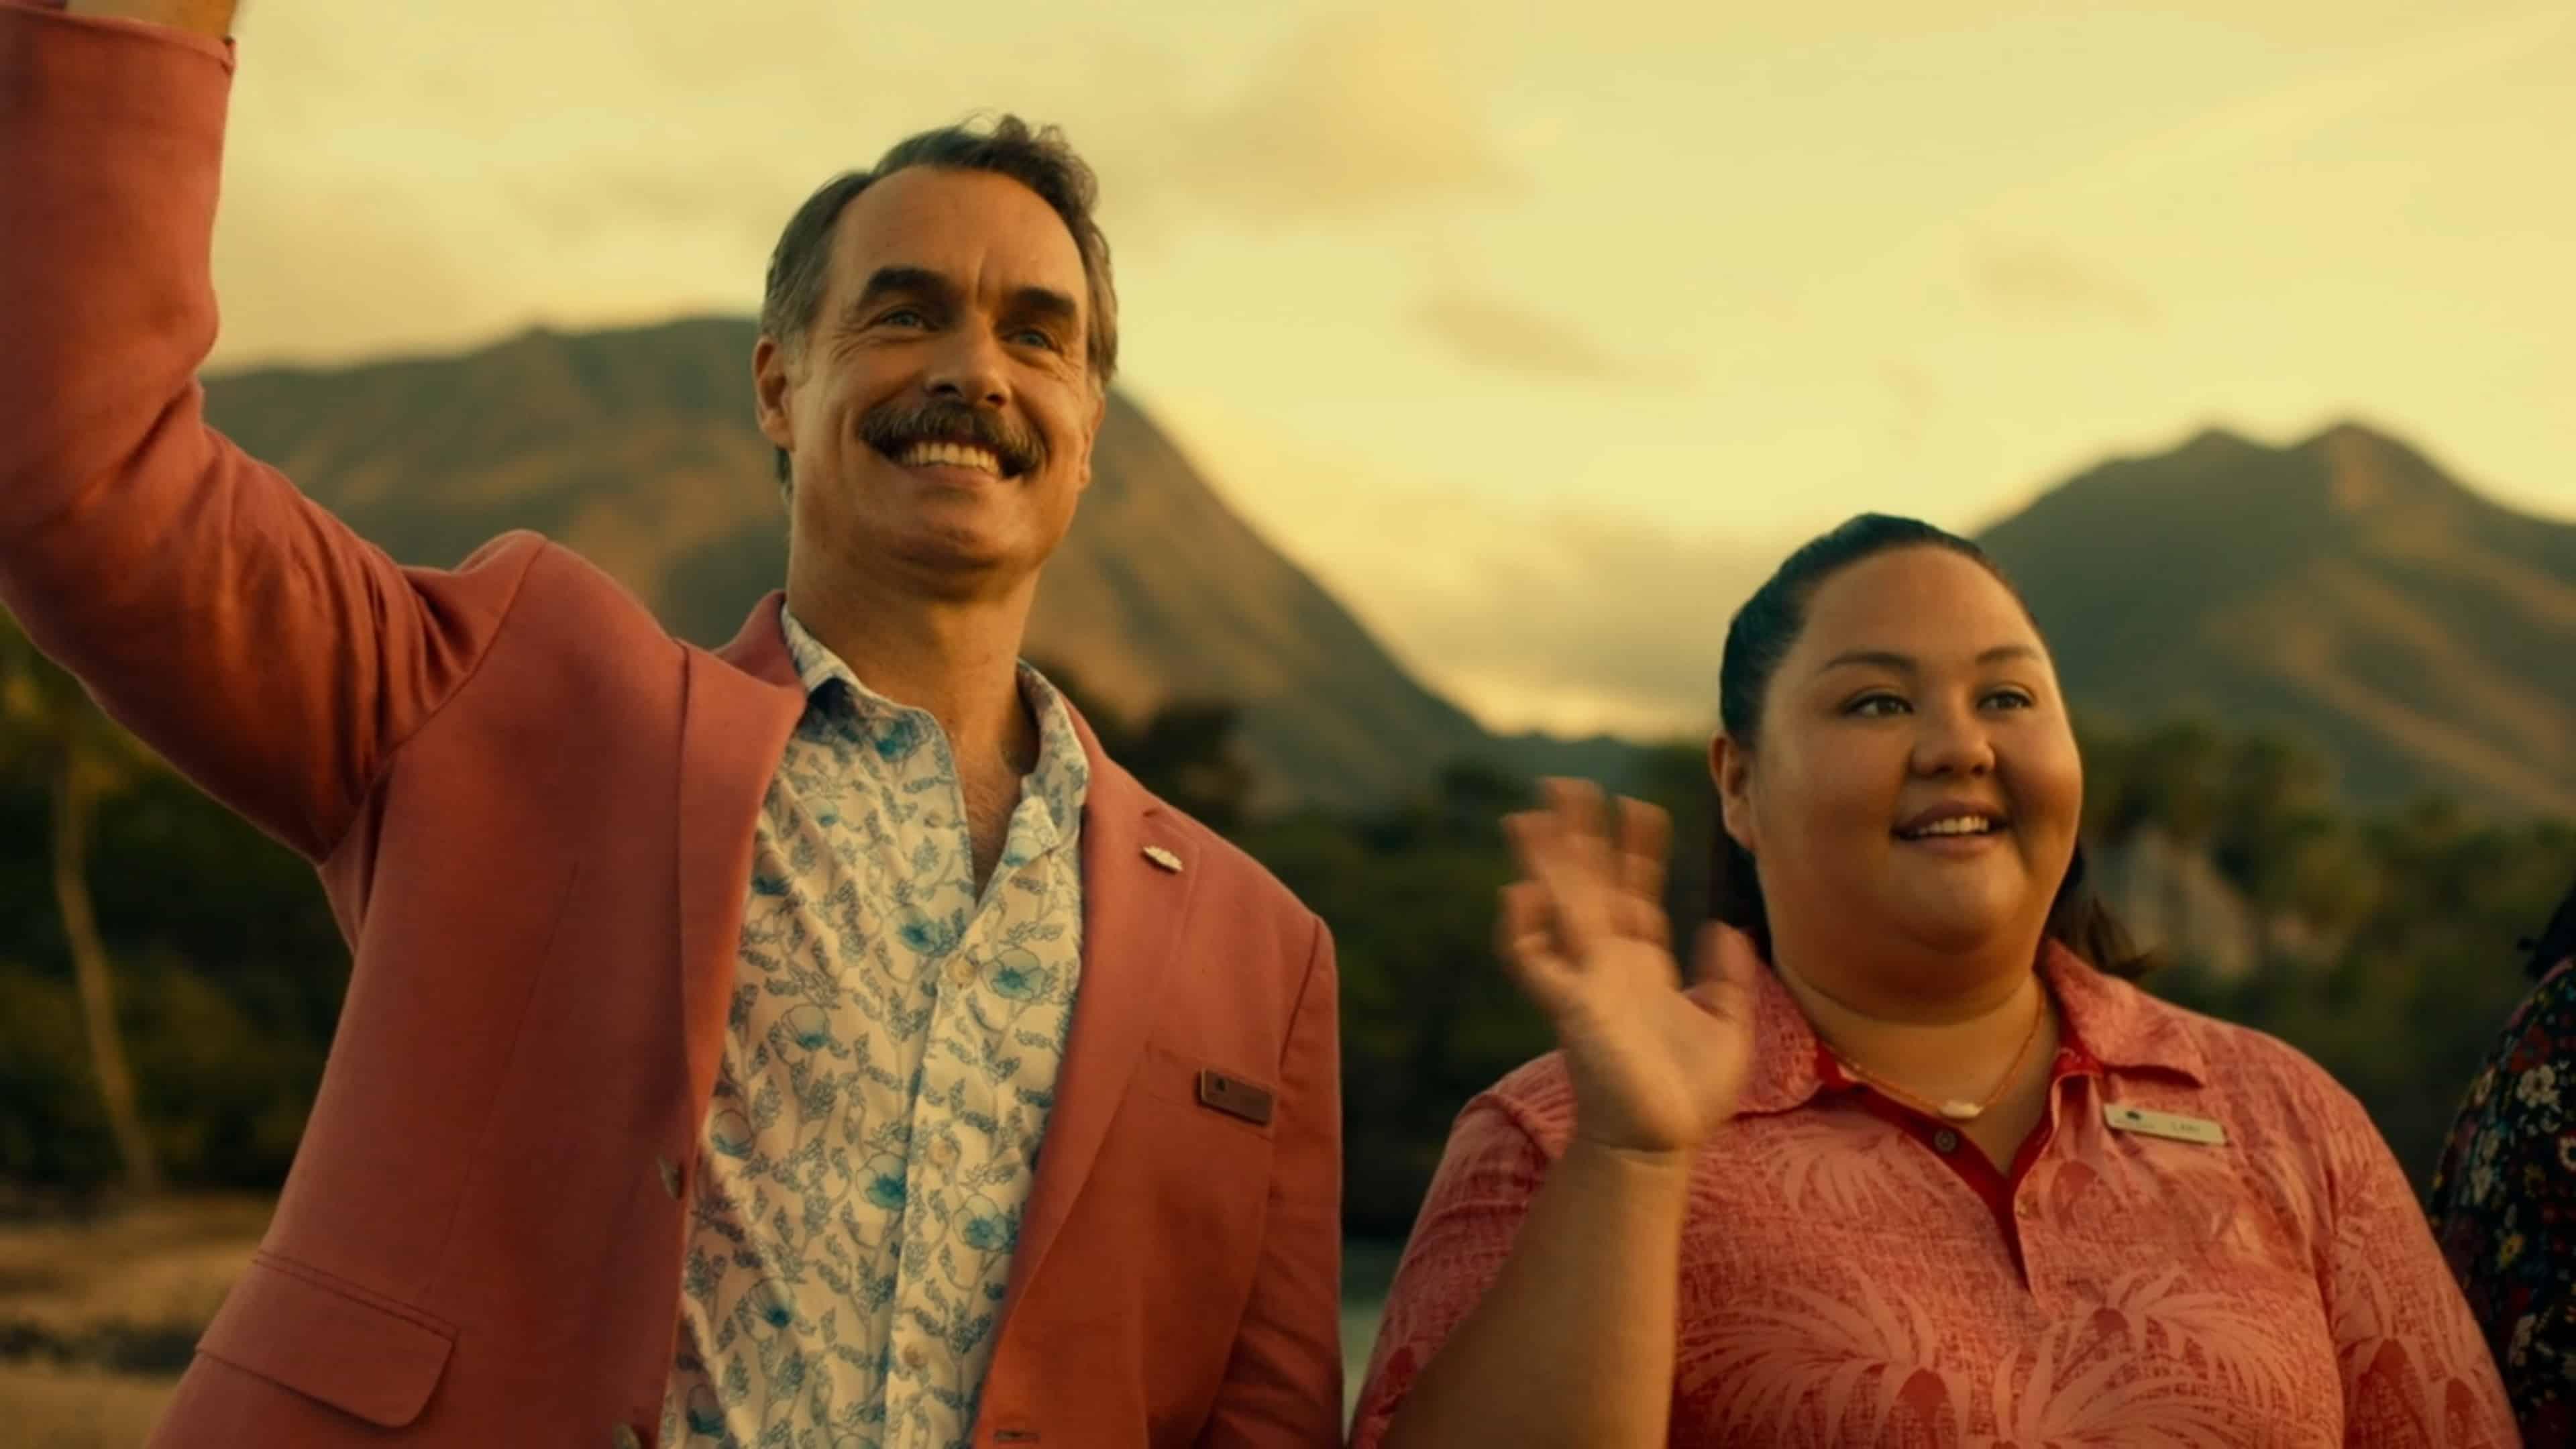 Armond (Murray Bartlett) and Lani (Jolene Purdy) waving